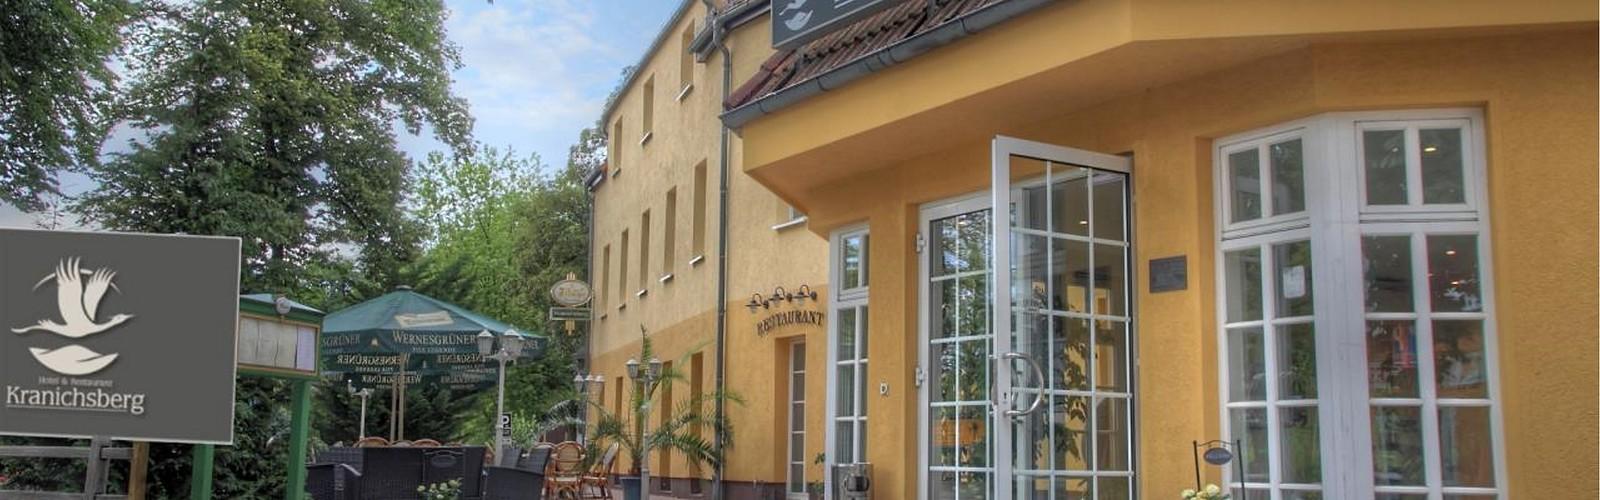 Entrance, photo: Hotel & Restaurant Kranichsberg